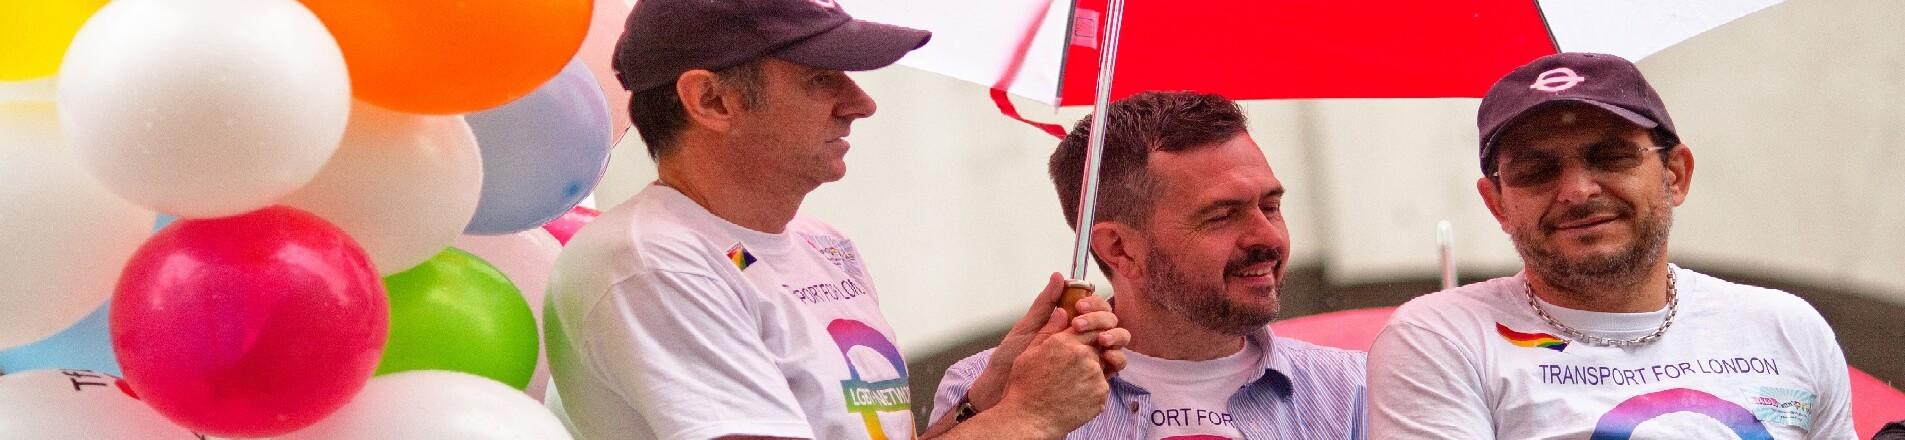 Zurich Launch Global LGBT Network